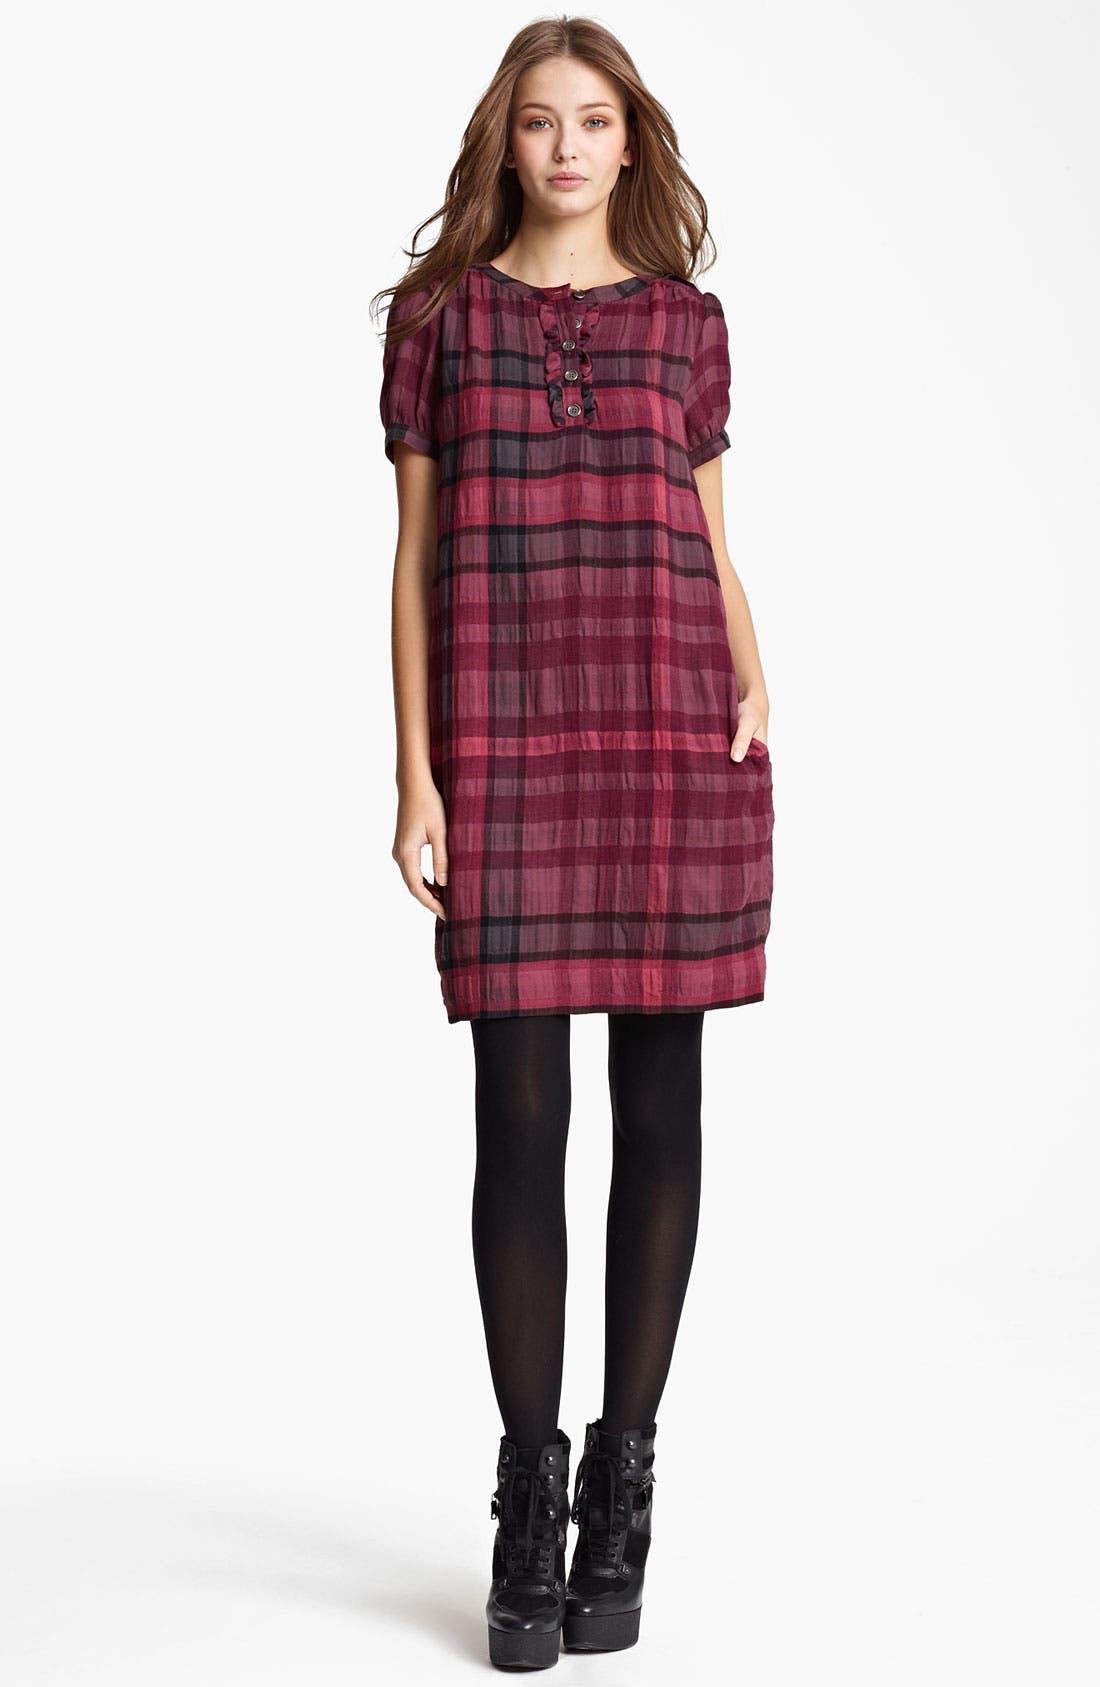 Main Image - Burberry Brit Check Print Dress